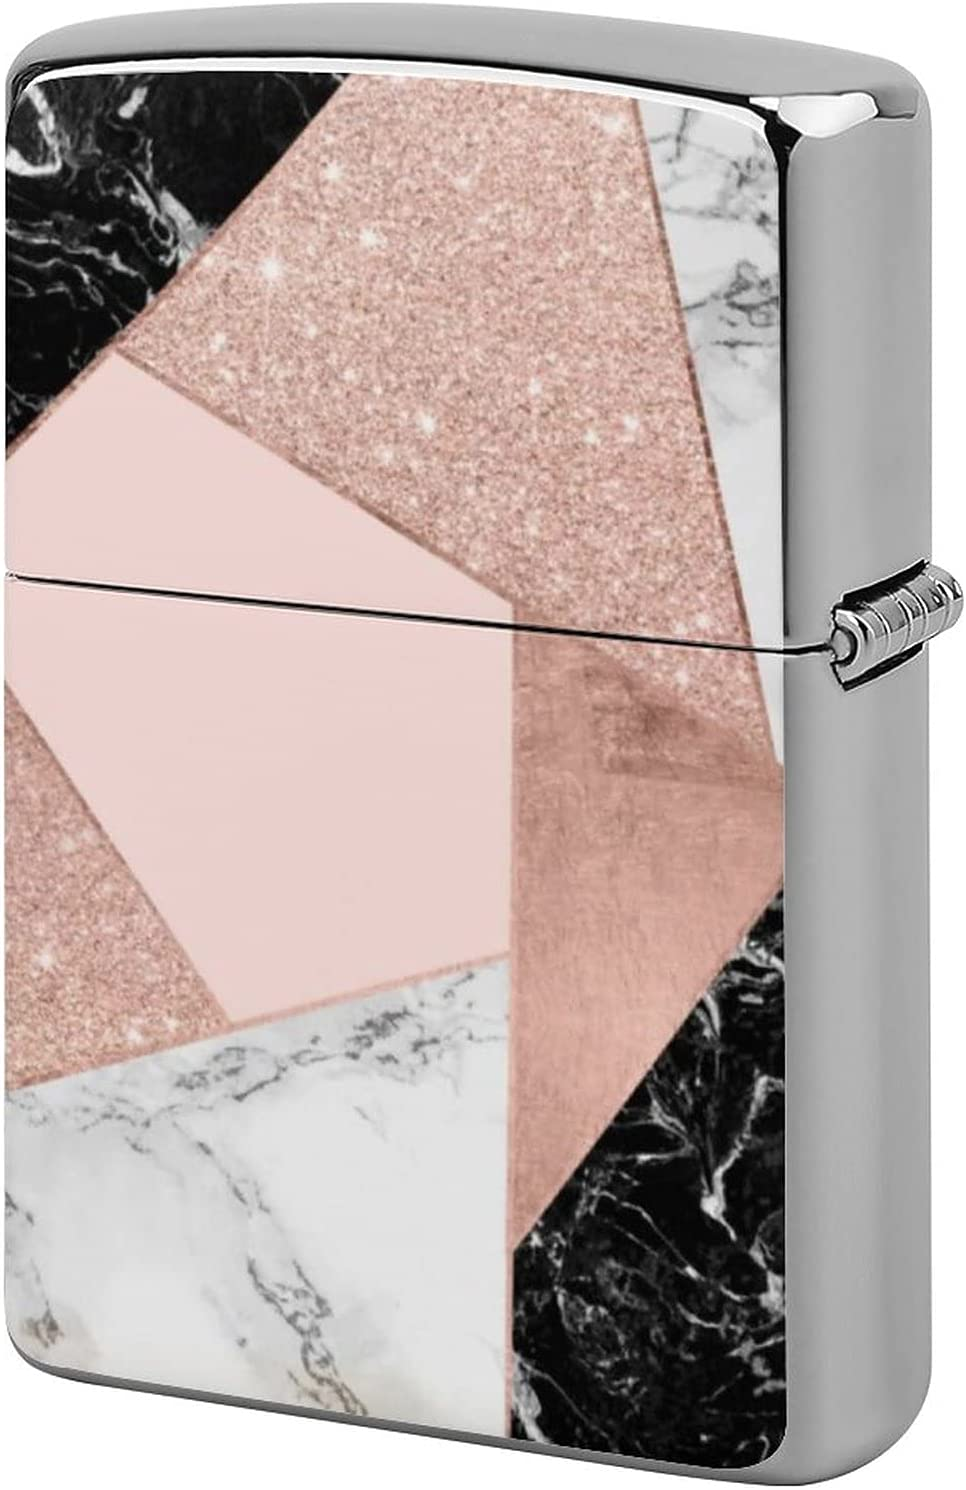 Unisex's Pocket [Alternative dealer] Lighter housing G Case Arlington Mall Personalize Metal